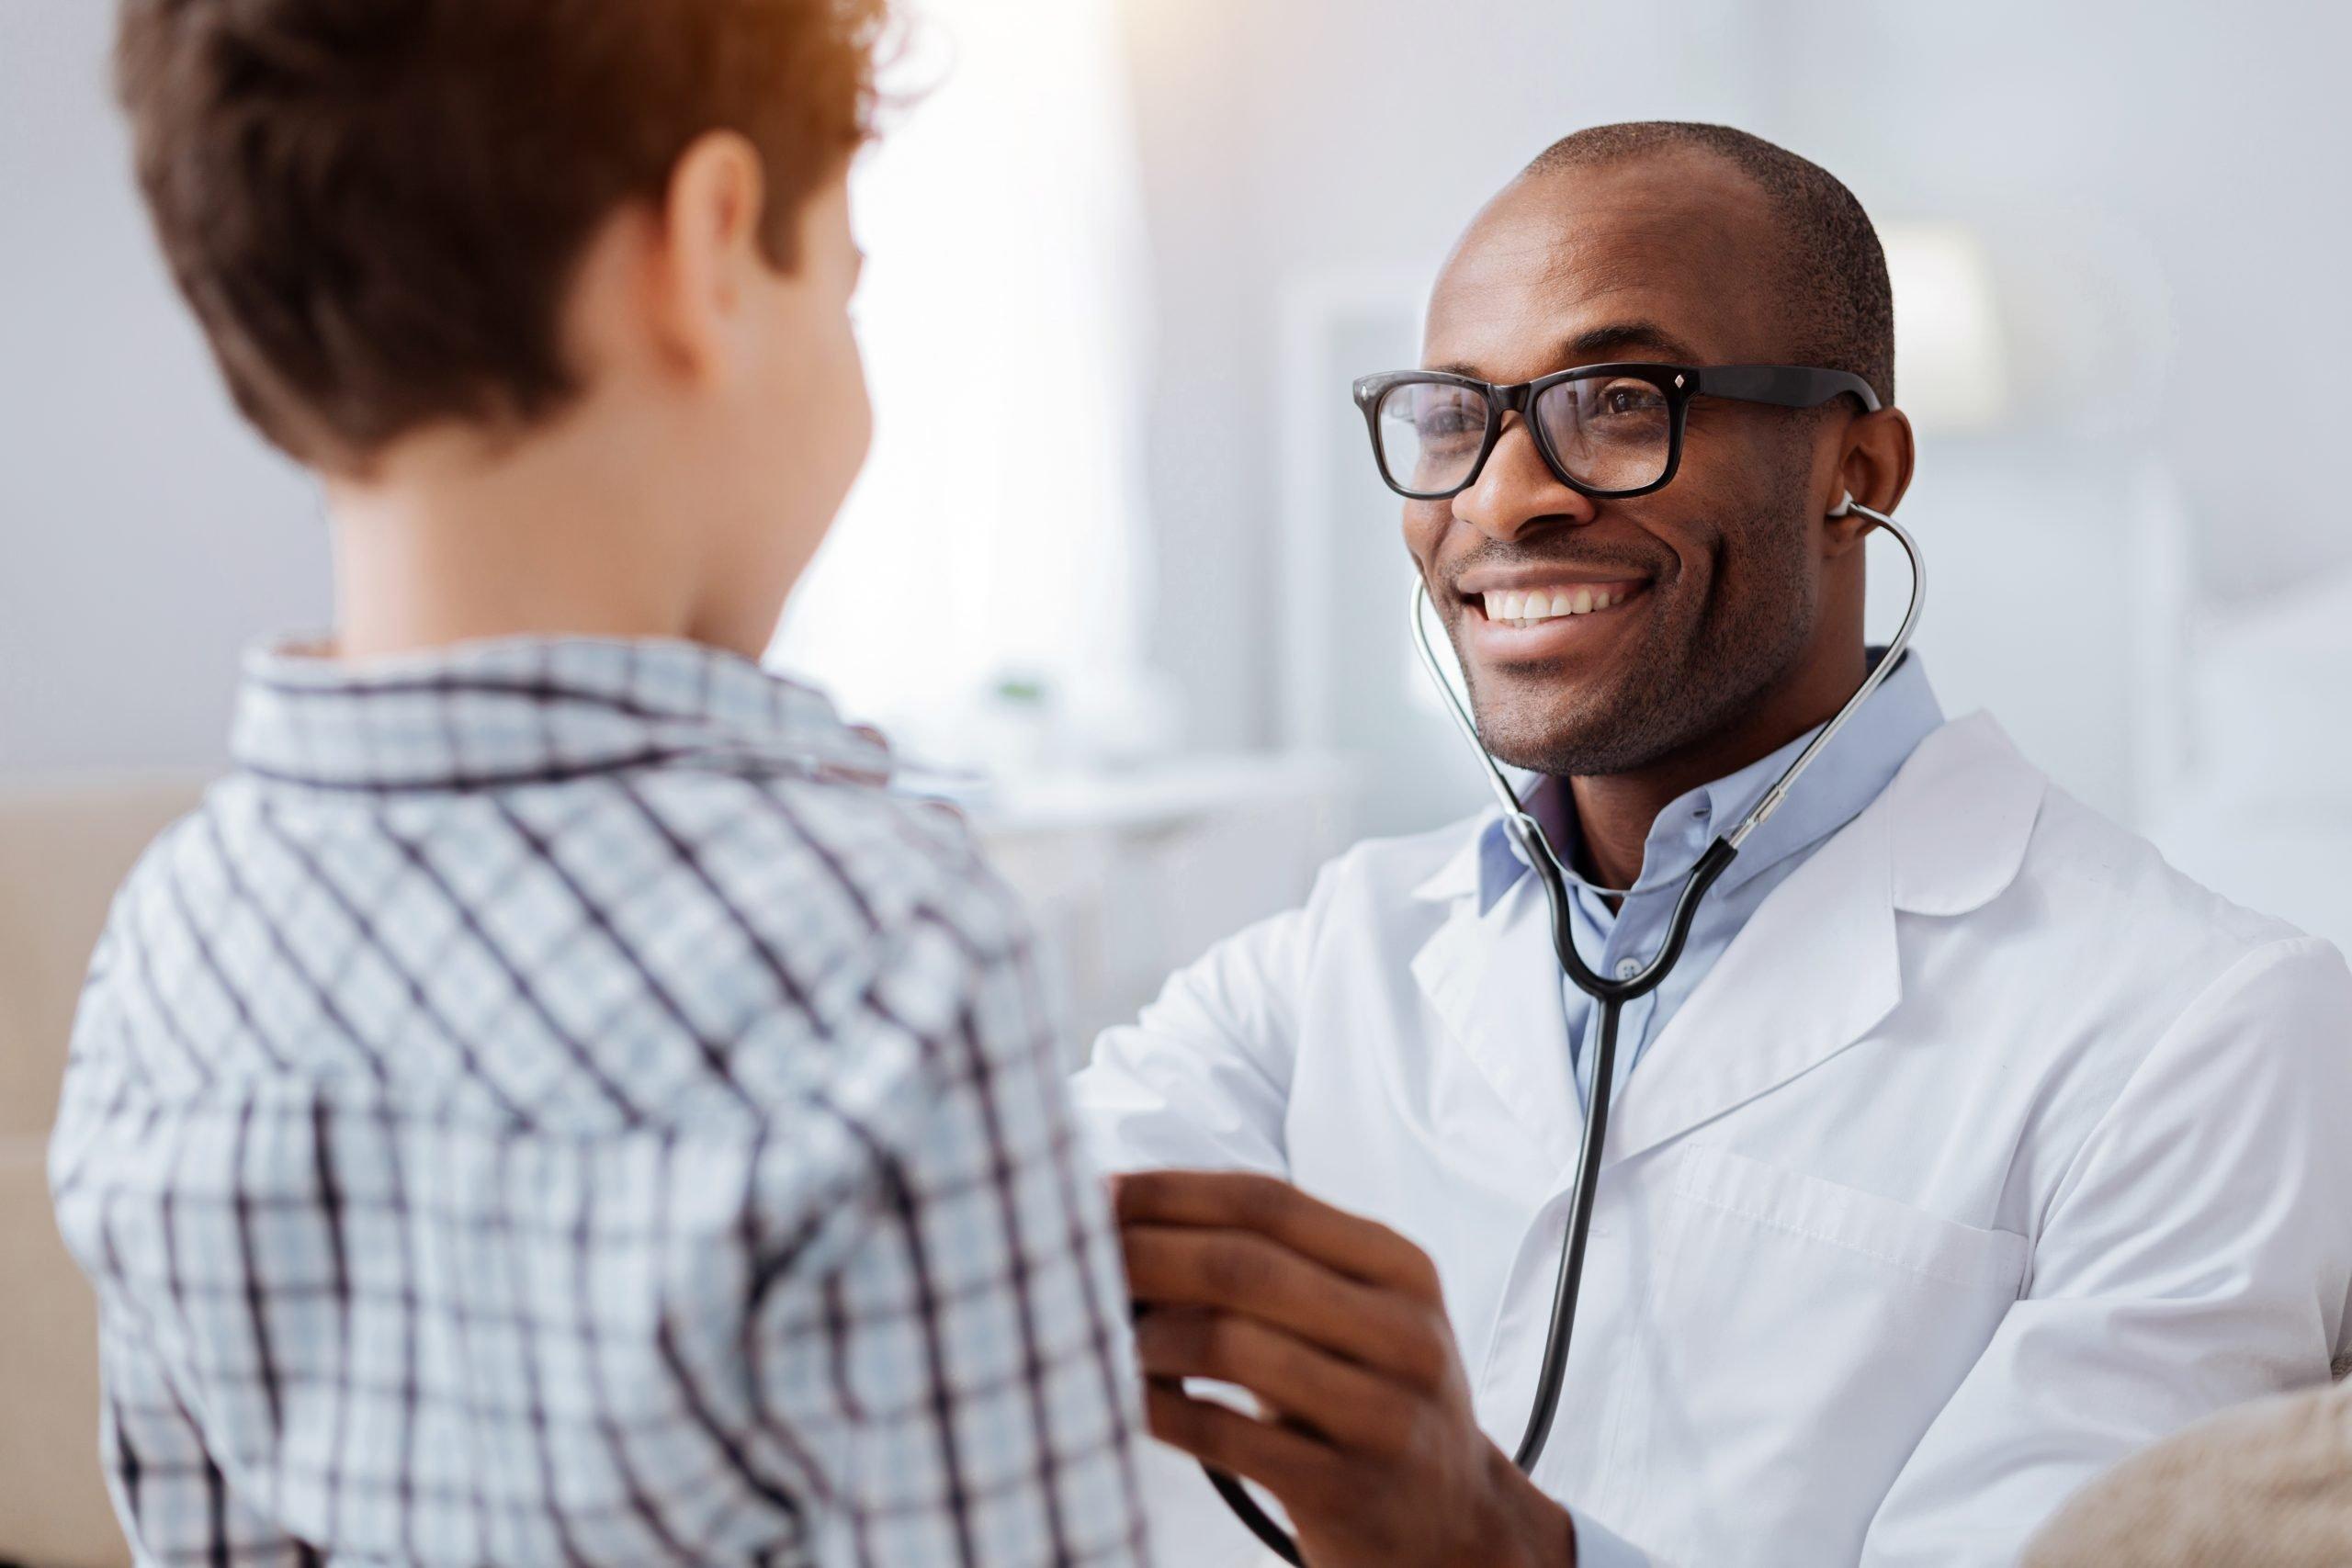 rmda-ss-healthcare-industry-doctor.2560.1707